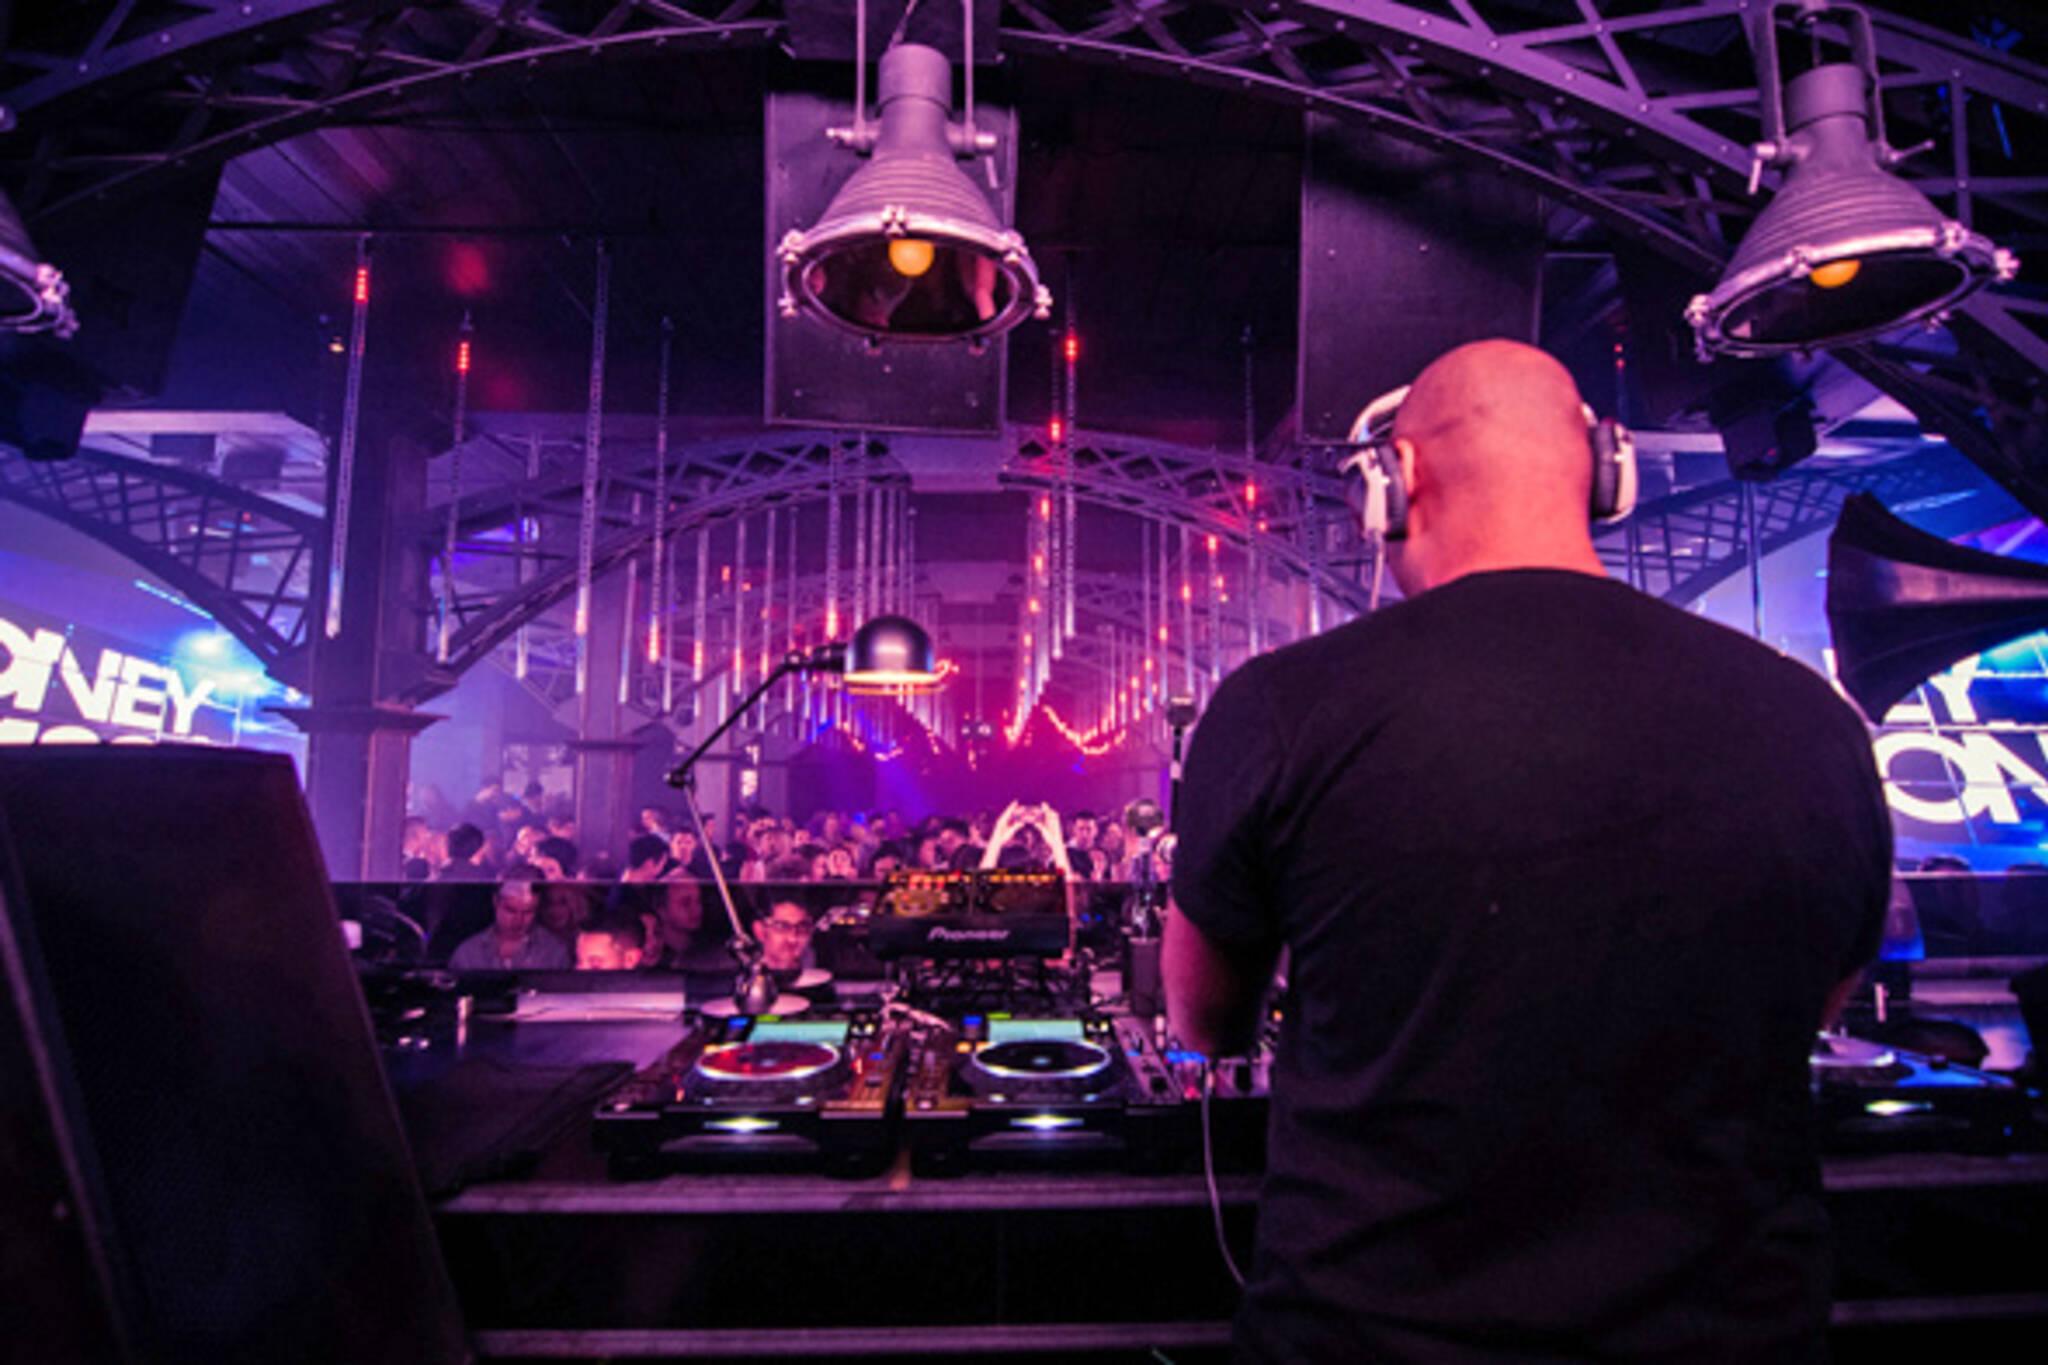 nightclubs Toronto